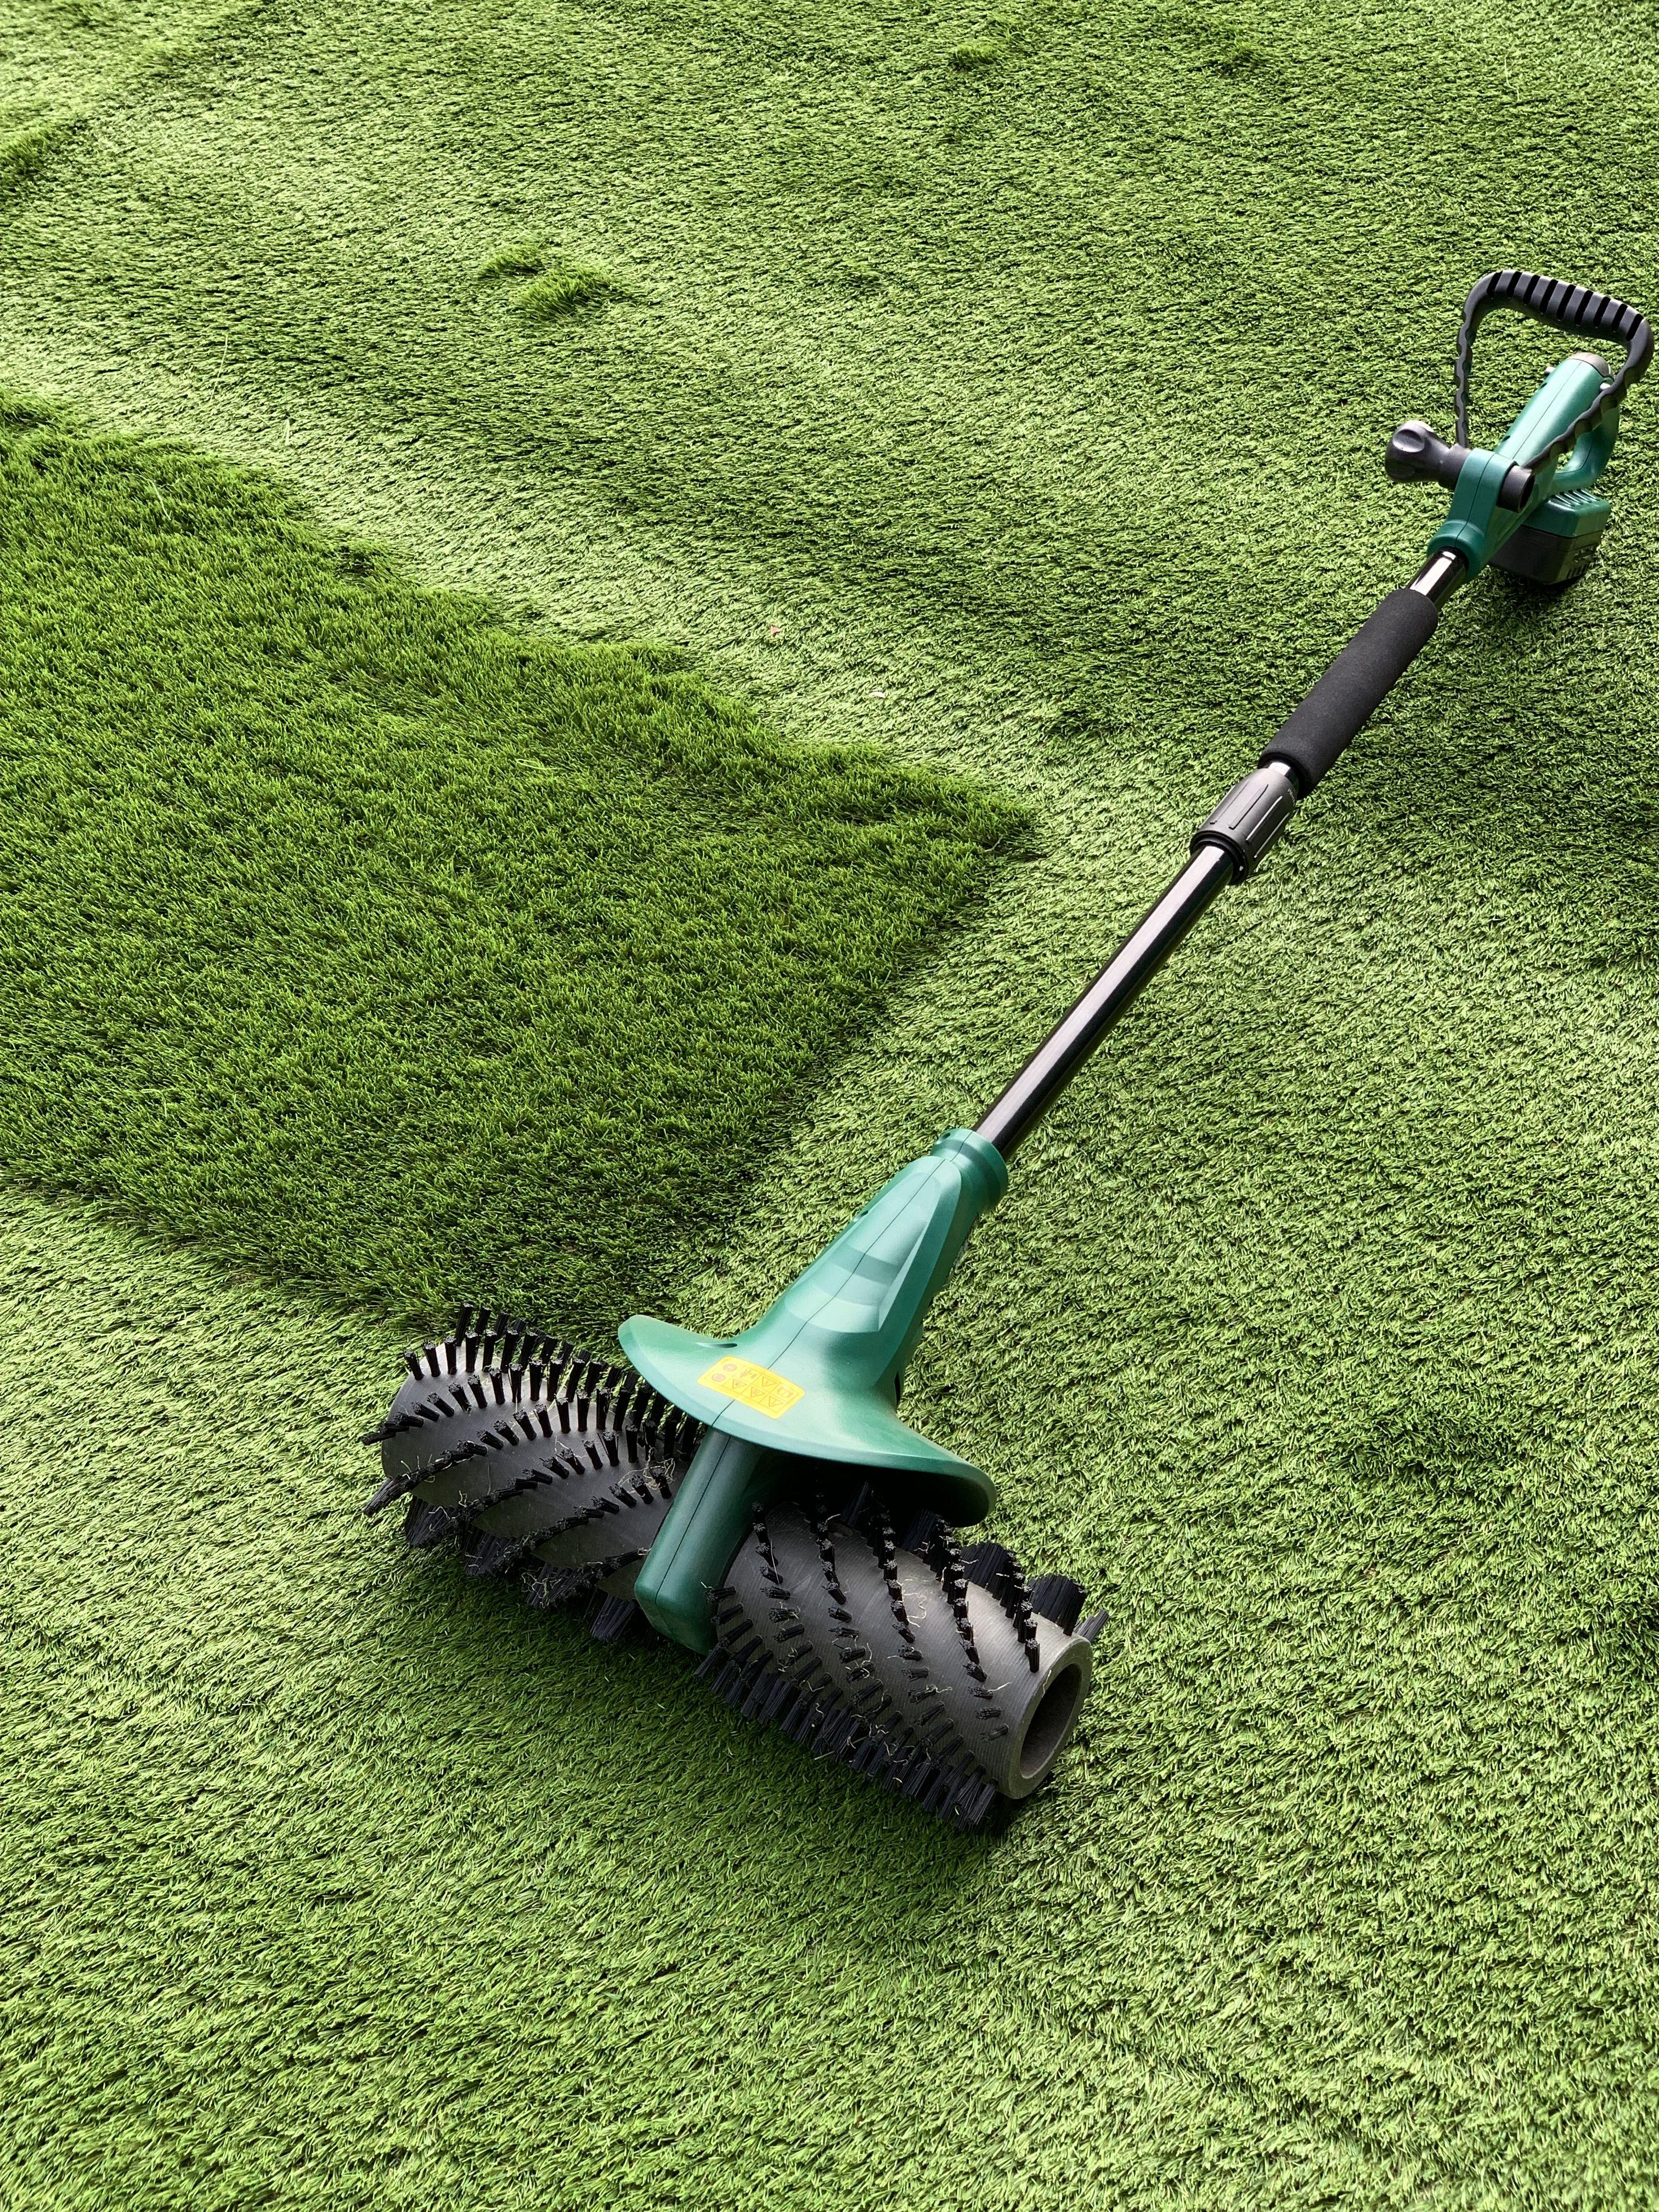 How To Clean Artificial Grass Artificial Grass Backyard Putting Green Laying Artificial Grass